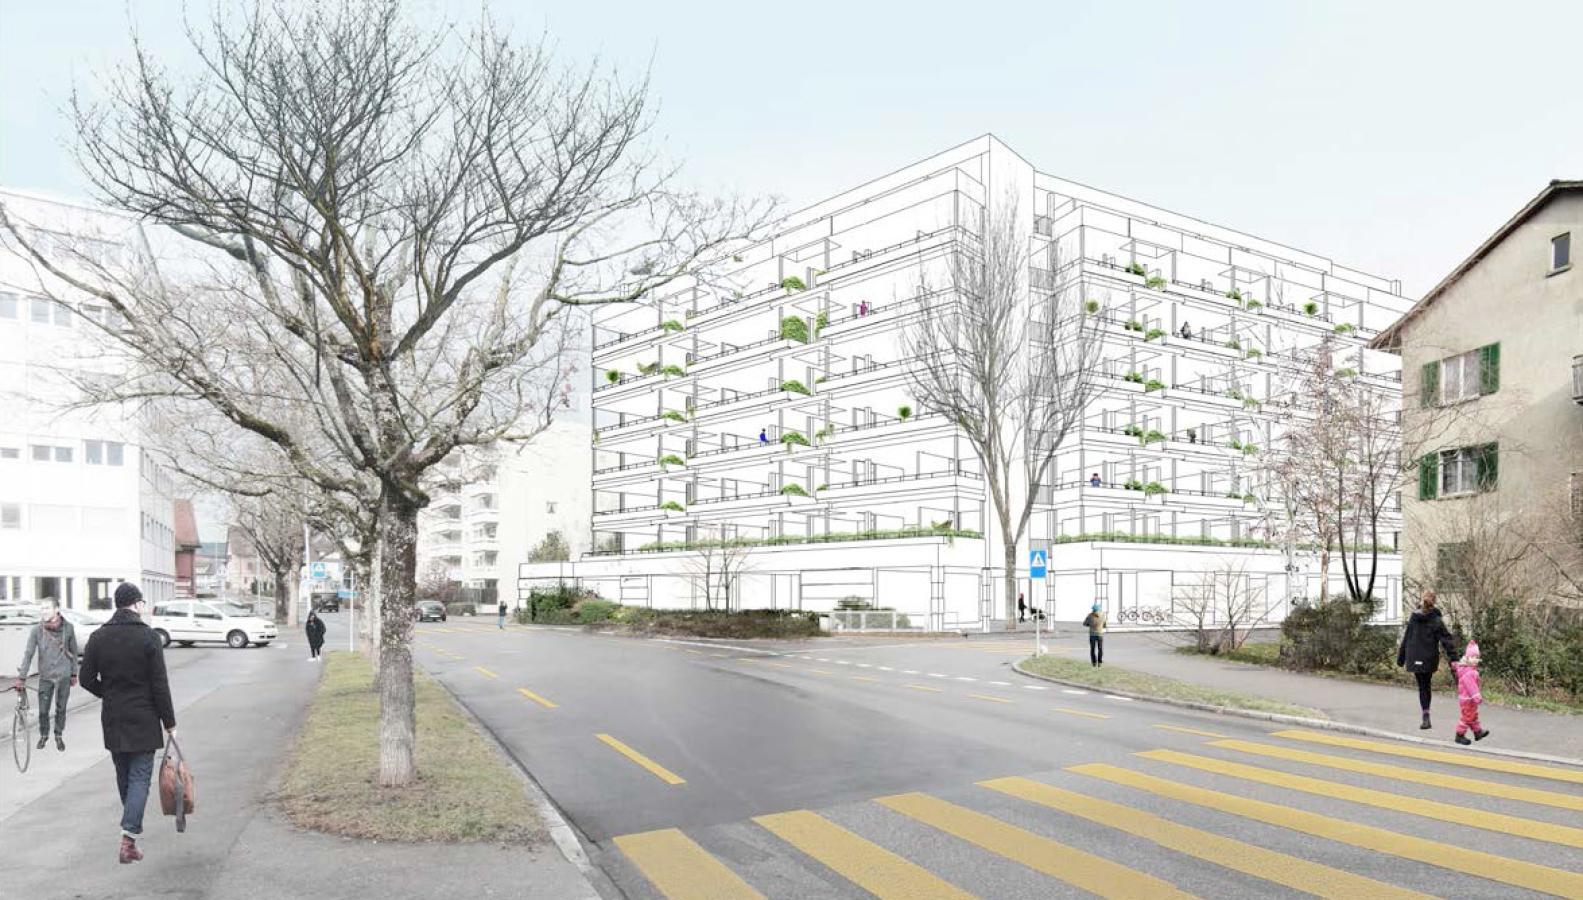 Siegerprojekt Carl von Studio Märkli (Visualisierung: Projektverfassende)